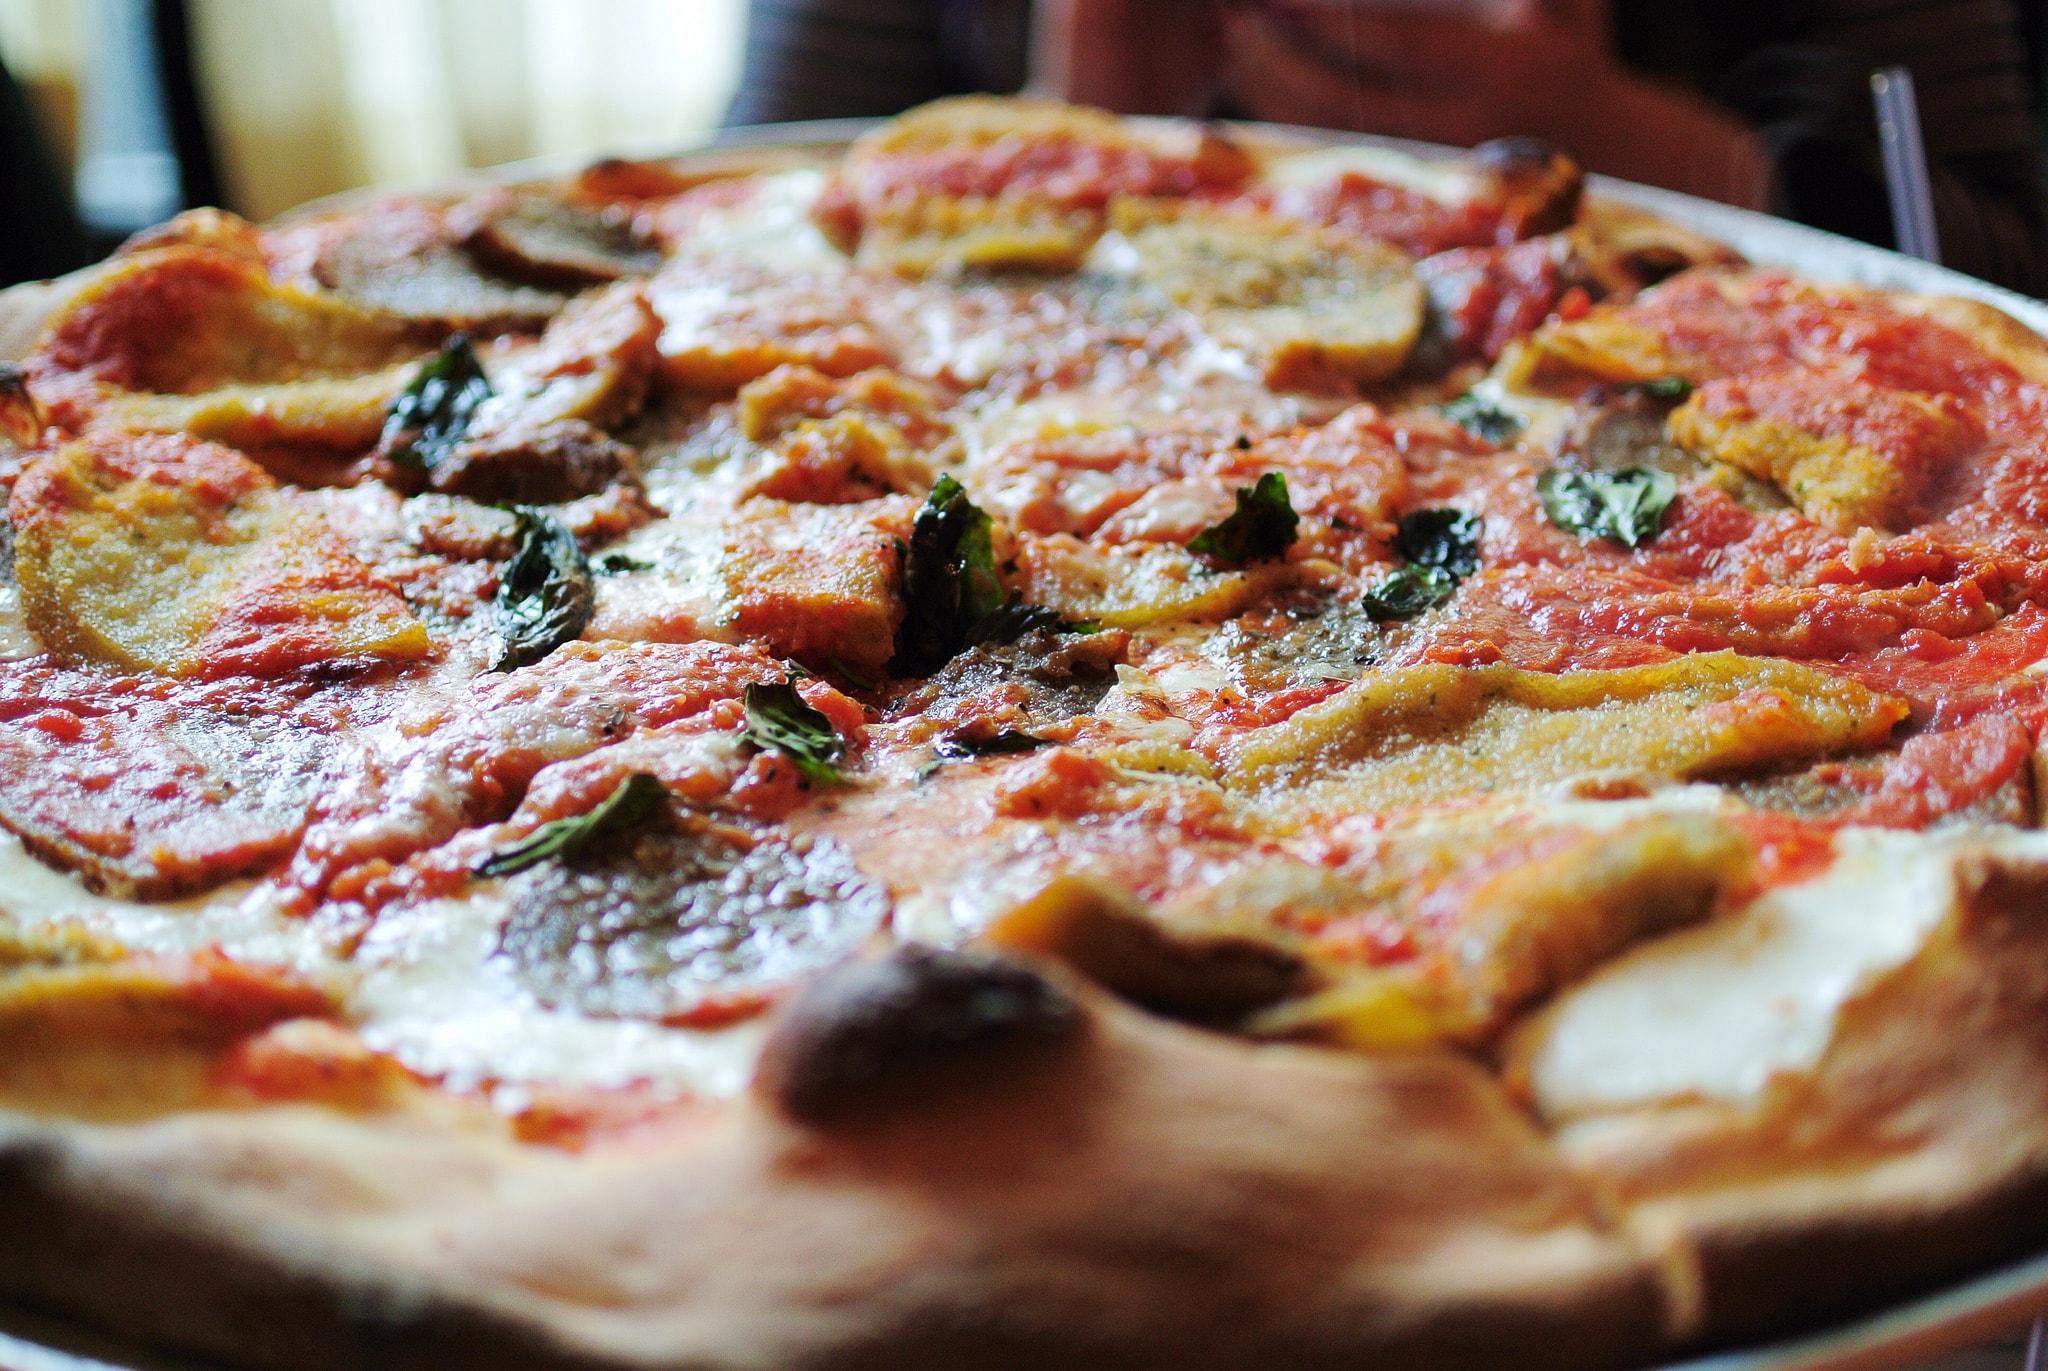 New York pizza | Chun Yip So Flickr